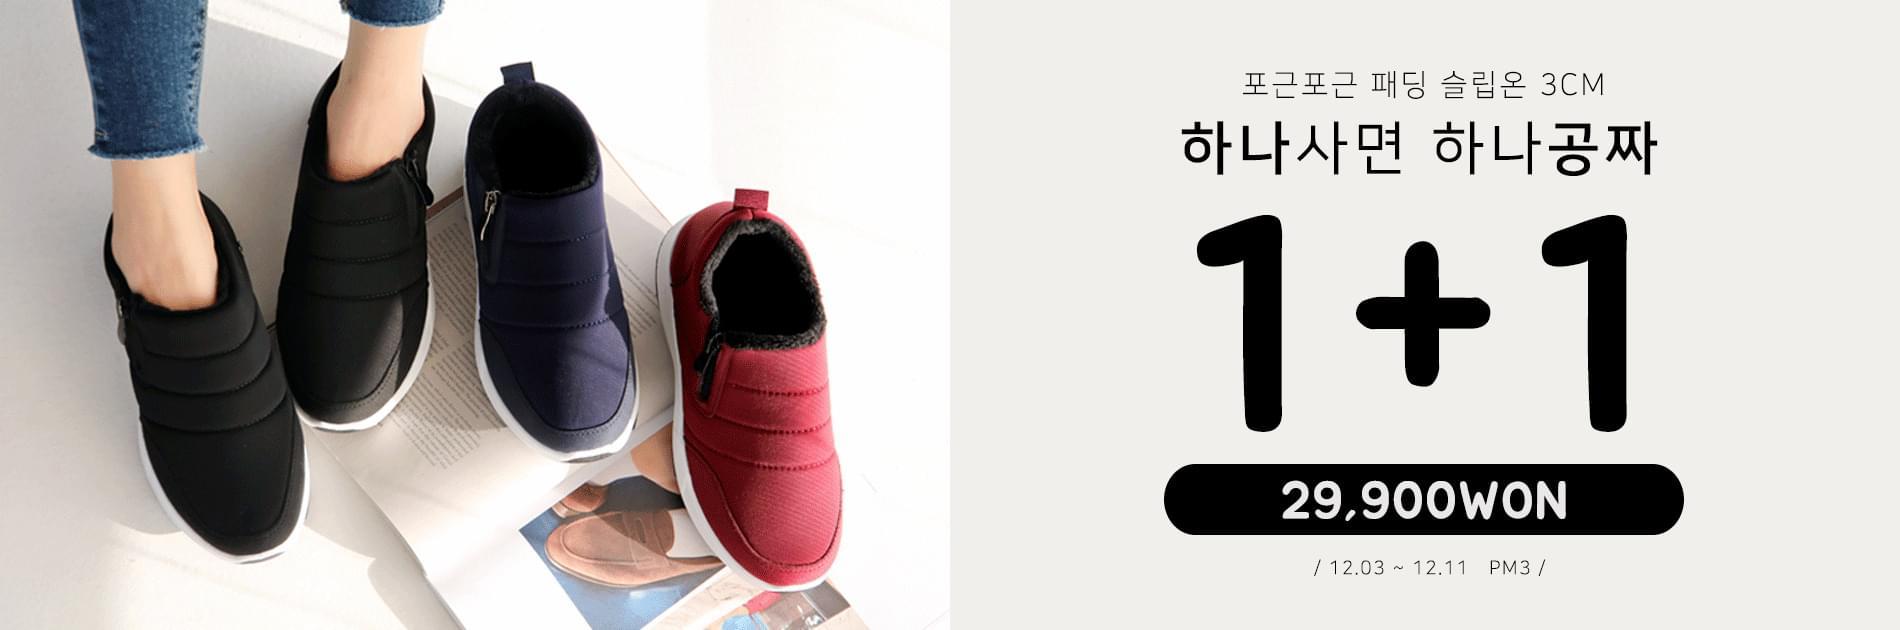 Cozy + Cozy padded slip-on 3cm 球鞋/布鞋